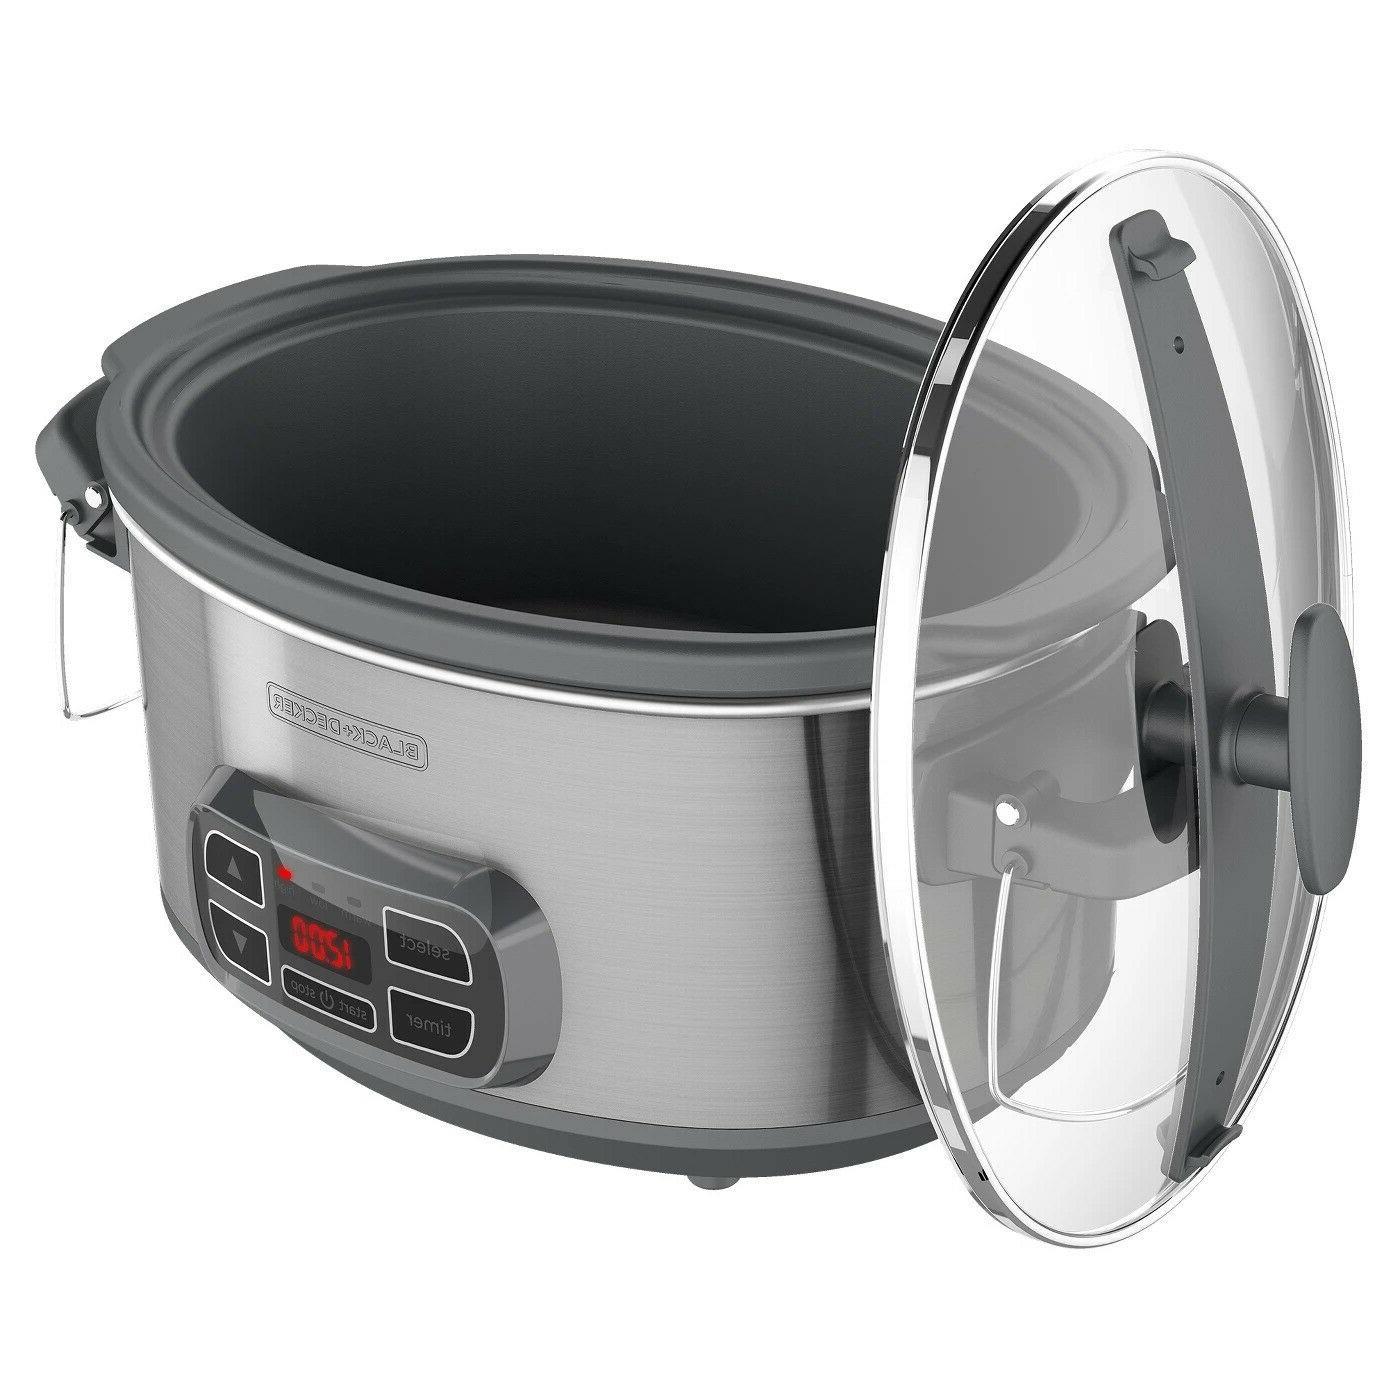 BLACK+DECKER 7qt Locking Digital Slow Cooker